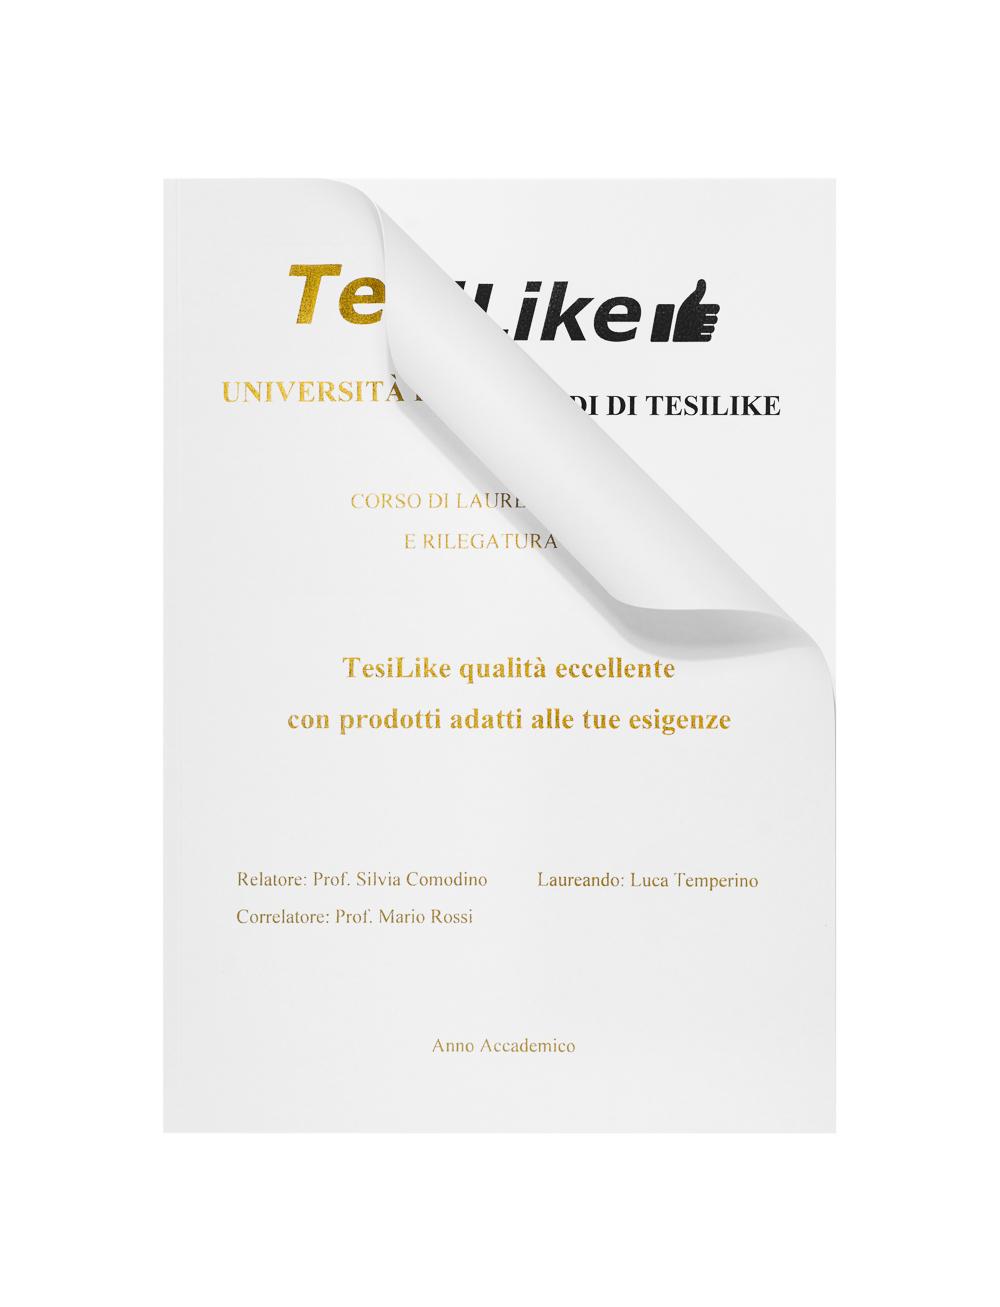 copertina-tesi-flessibile-bianca-frontespizio-oro-dettaglio-tesilike